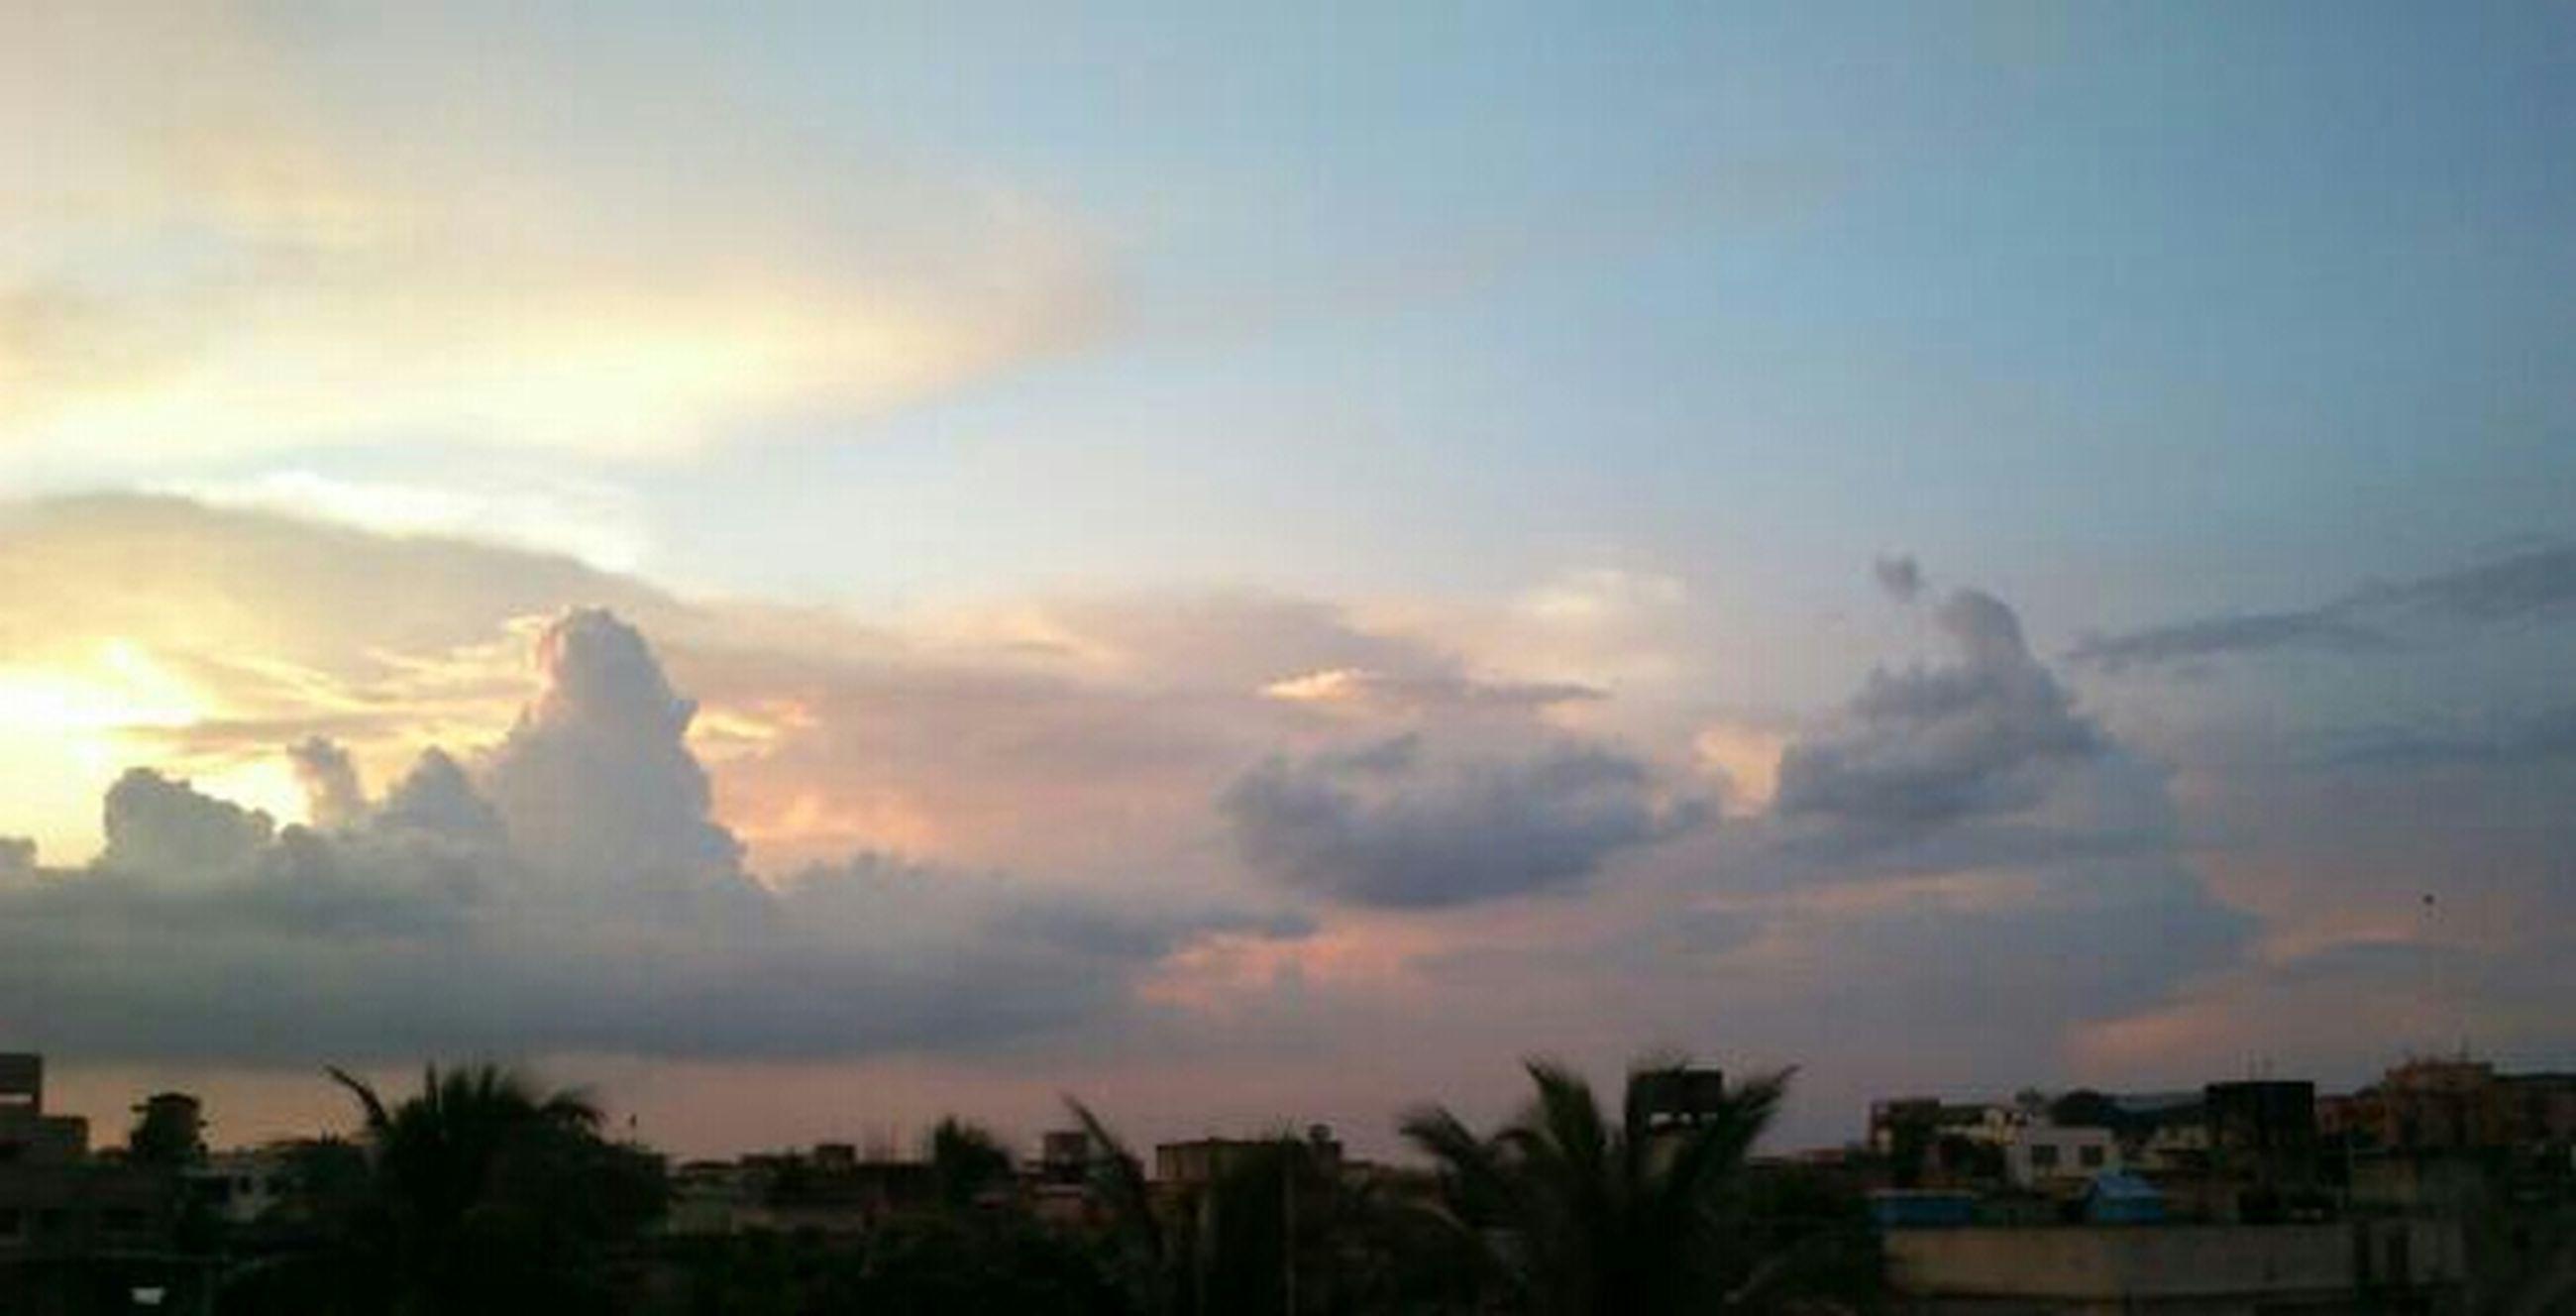 sunset, sky, building exterior, cloud - sky, architecture, built structure, scenics, beauty in nature, cloudy, nature, cloud, dusk, tranquil scene, tranquility, weather, tree, city, house, orange color, silhouette